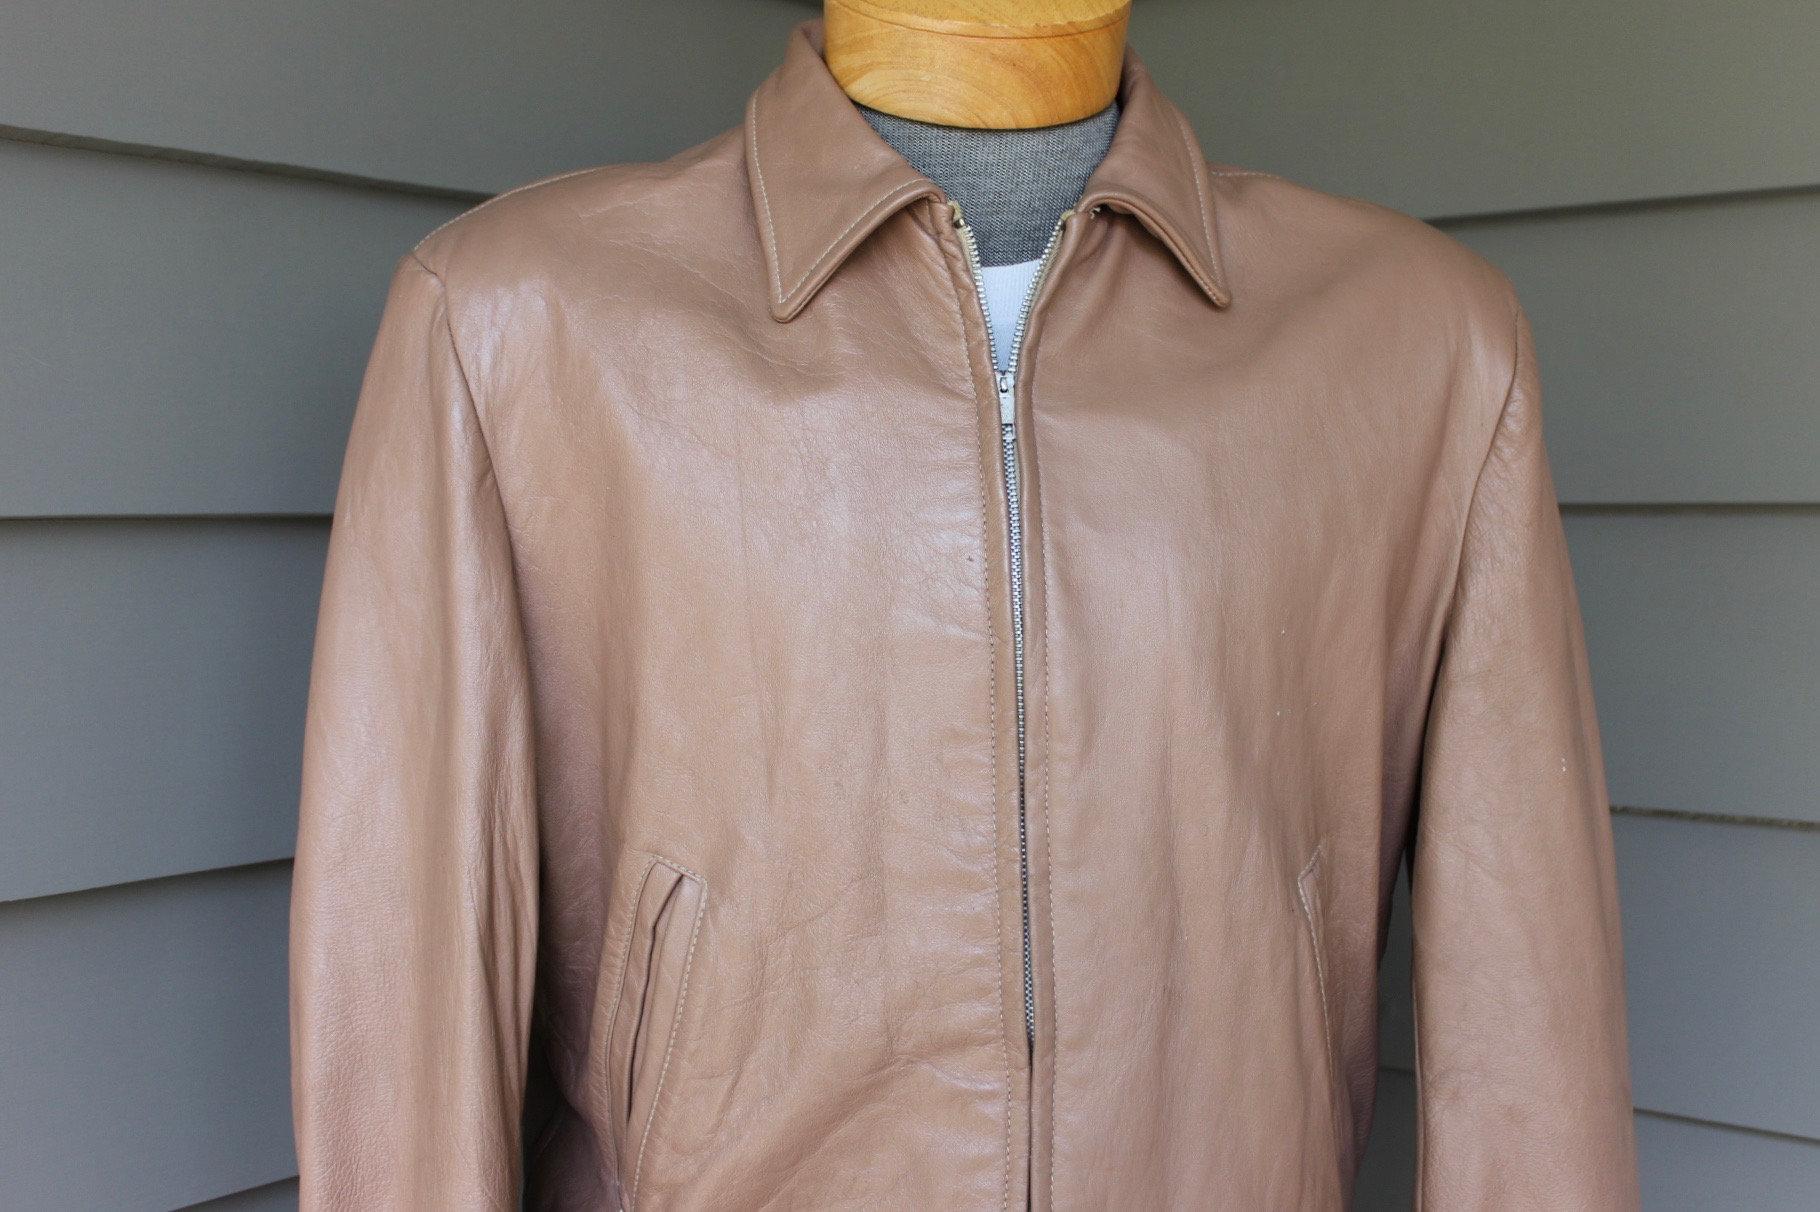 1950s Men's Ties, Bow Ties – Vintage, Skinny, Knit Vintage 1950s -Unknown Maker- Mens Leather Cossack Jacket. Imported Xxx Goatskin - Zipper Front Size 40 42 $154.79 AT vintagedancer.com